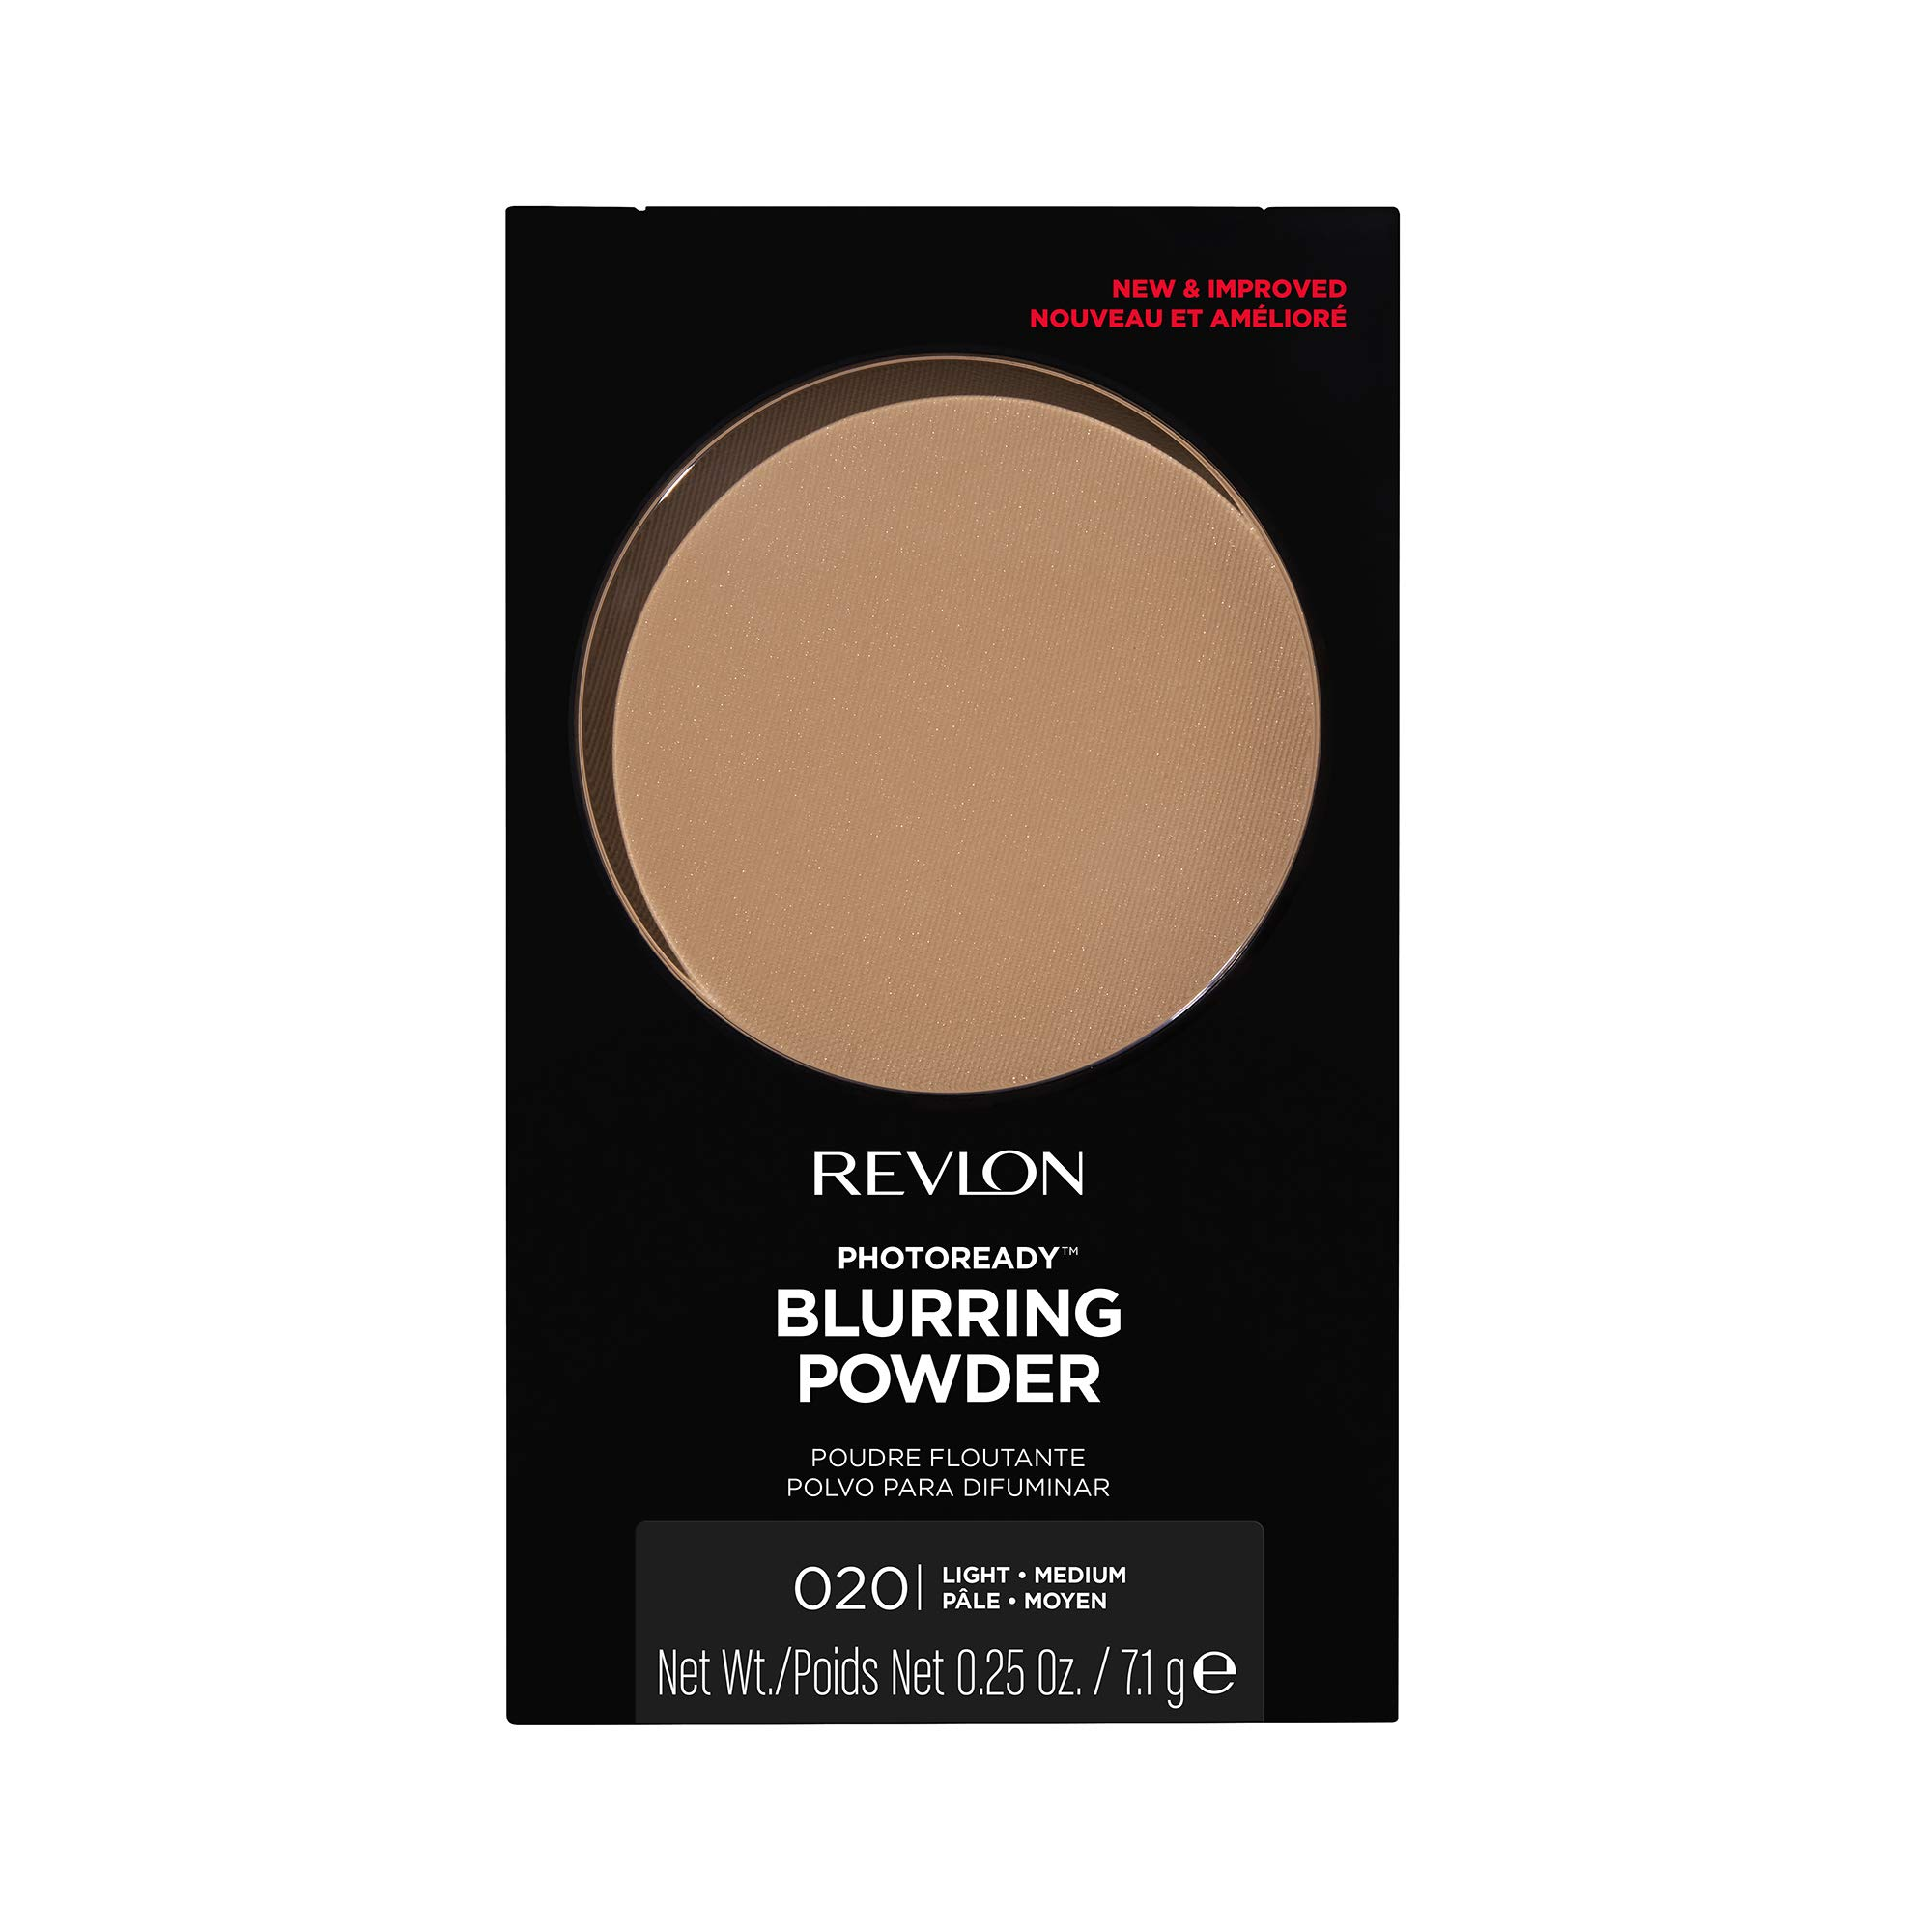 Revlon PhotoReady Powder, Lightweight and Mattifying Natural Finish Pressed Face Makeup, Oil Free, 020 Light/Medium, 0.25 oz